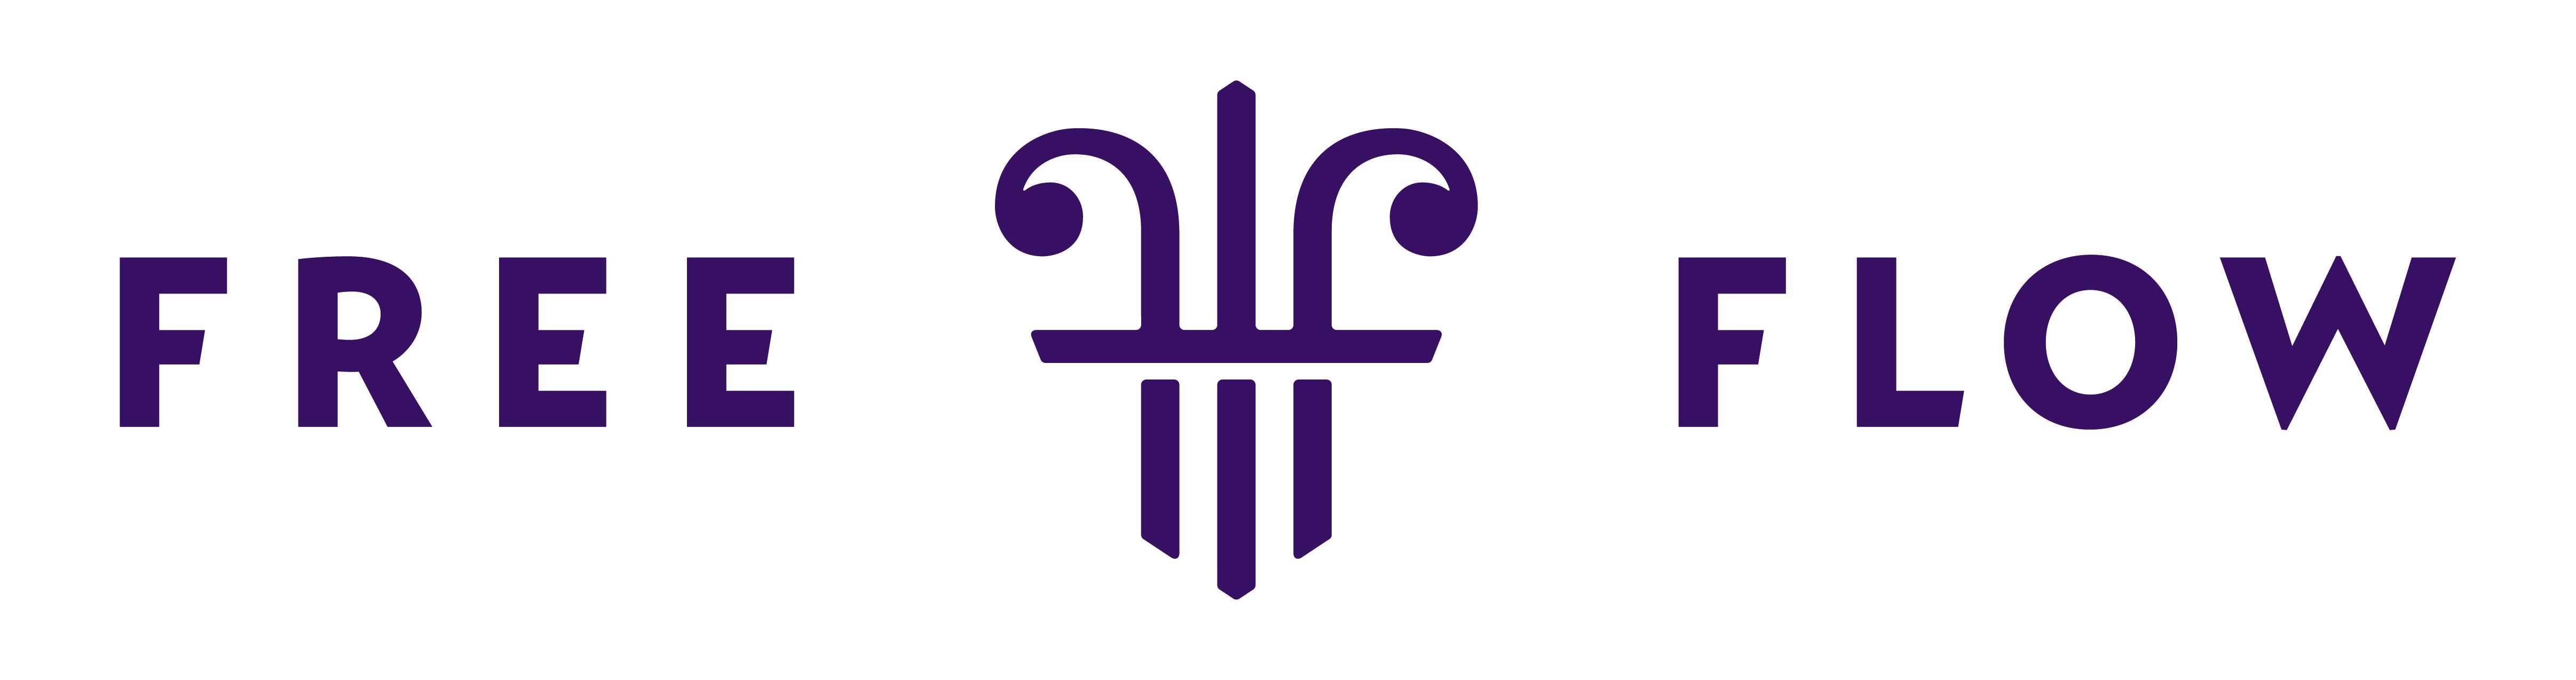 FreeFlow-Primary-Horizontal-Mark-Purple